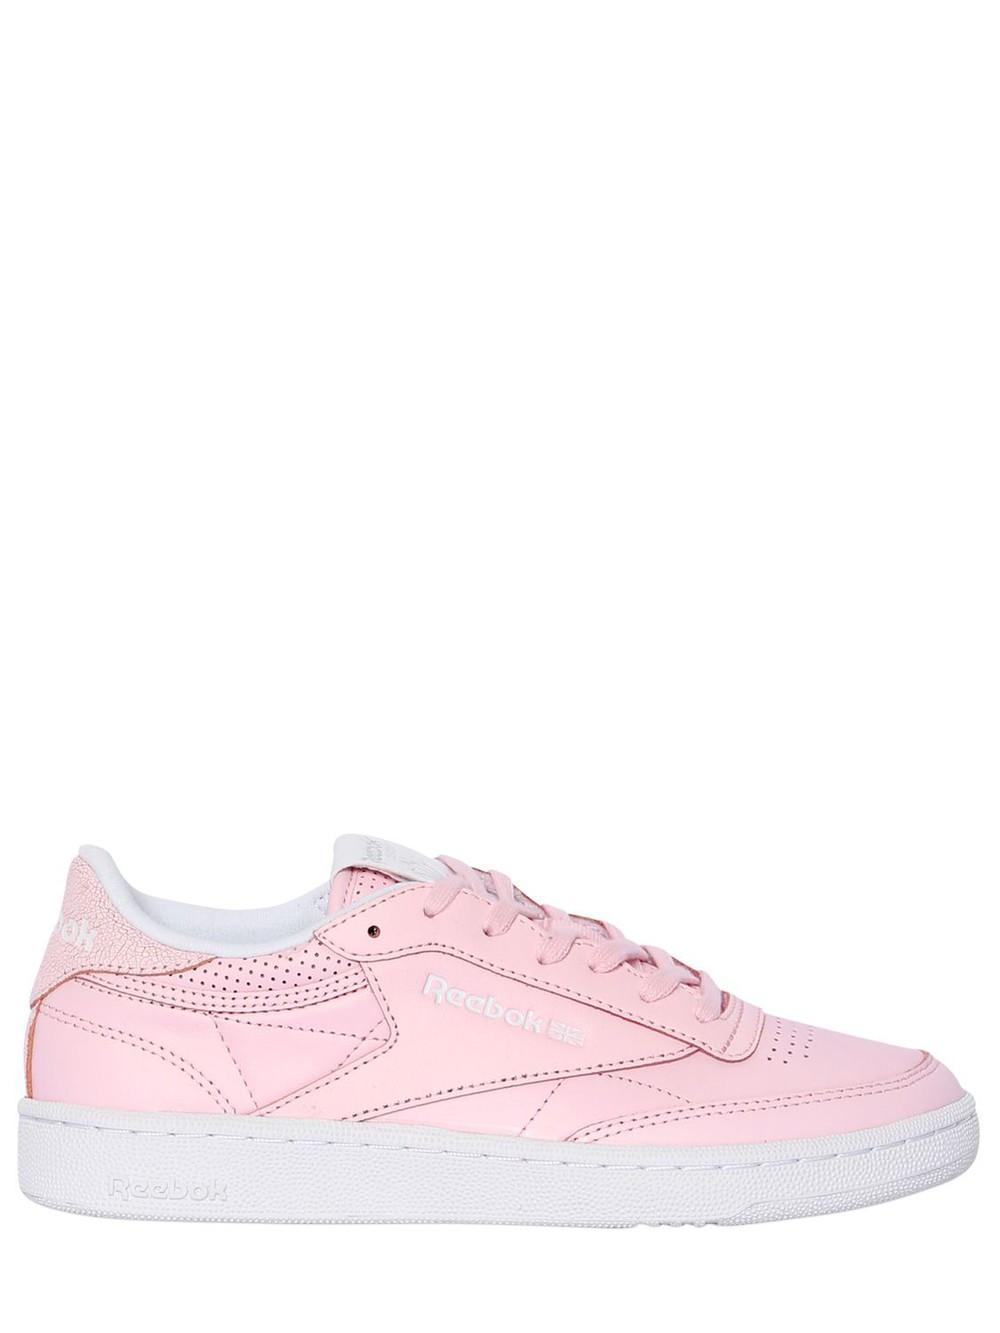 REEBOK CLASSICS Club C 85 Fbt Leather Sneakers in pink